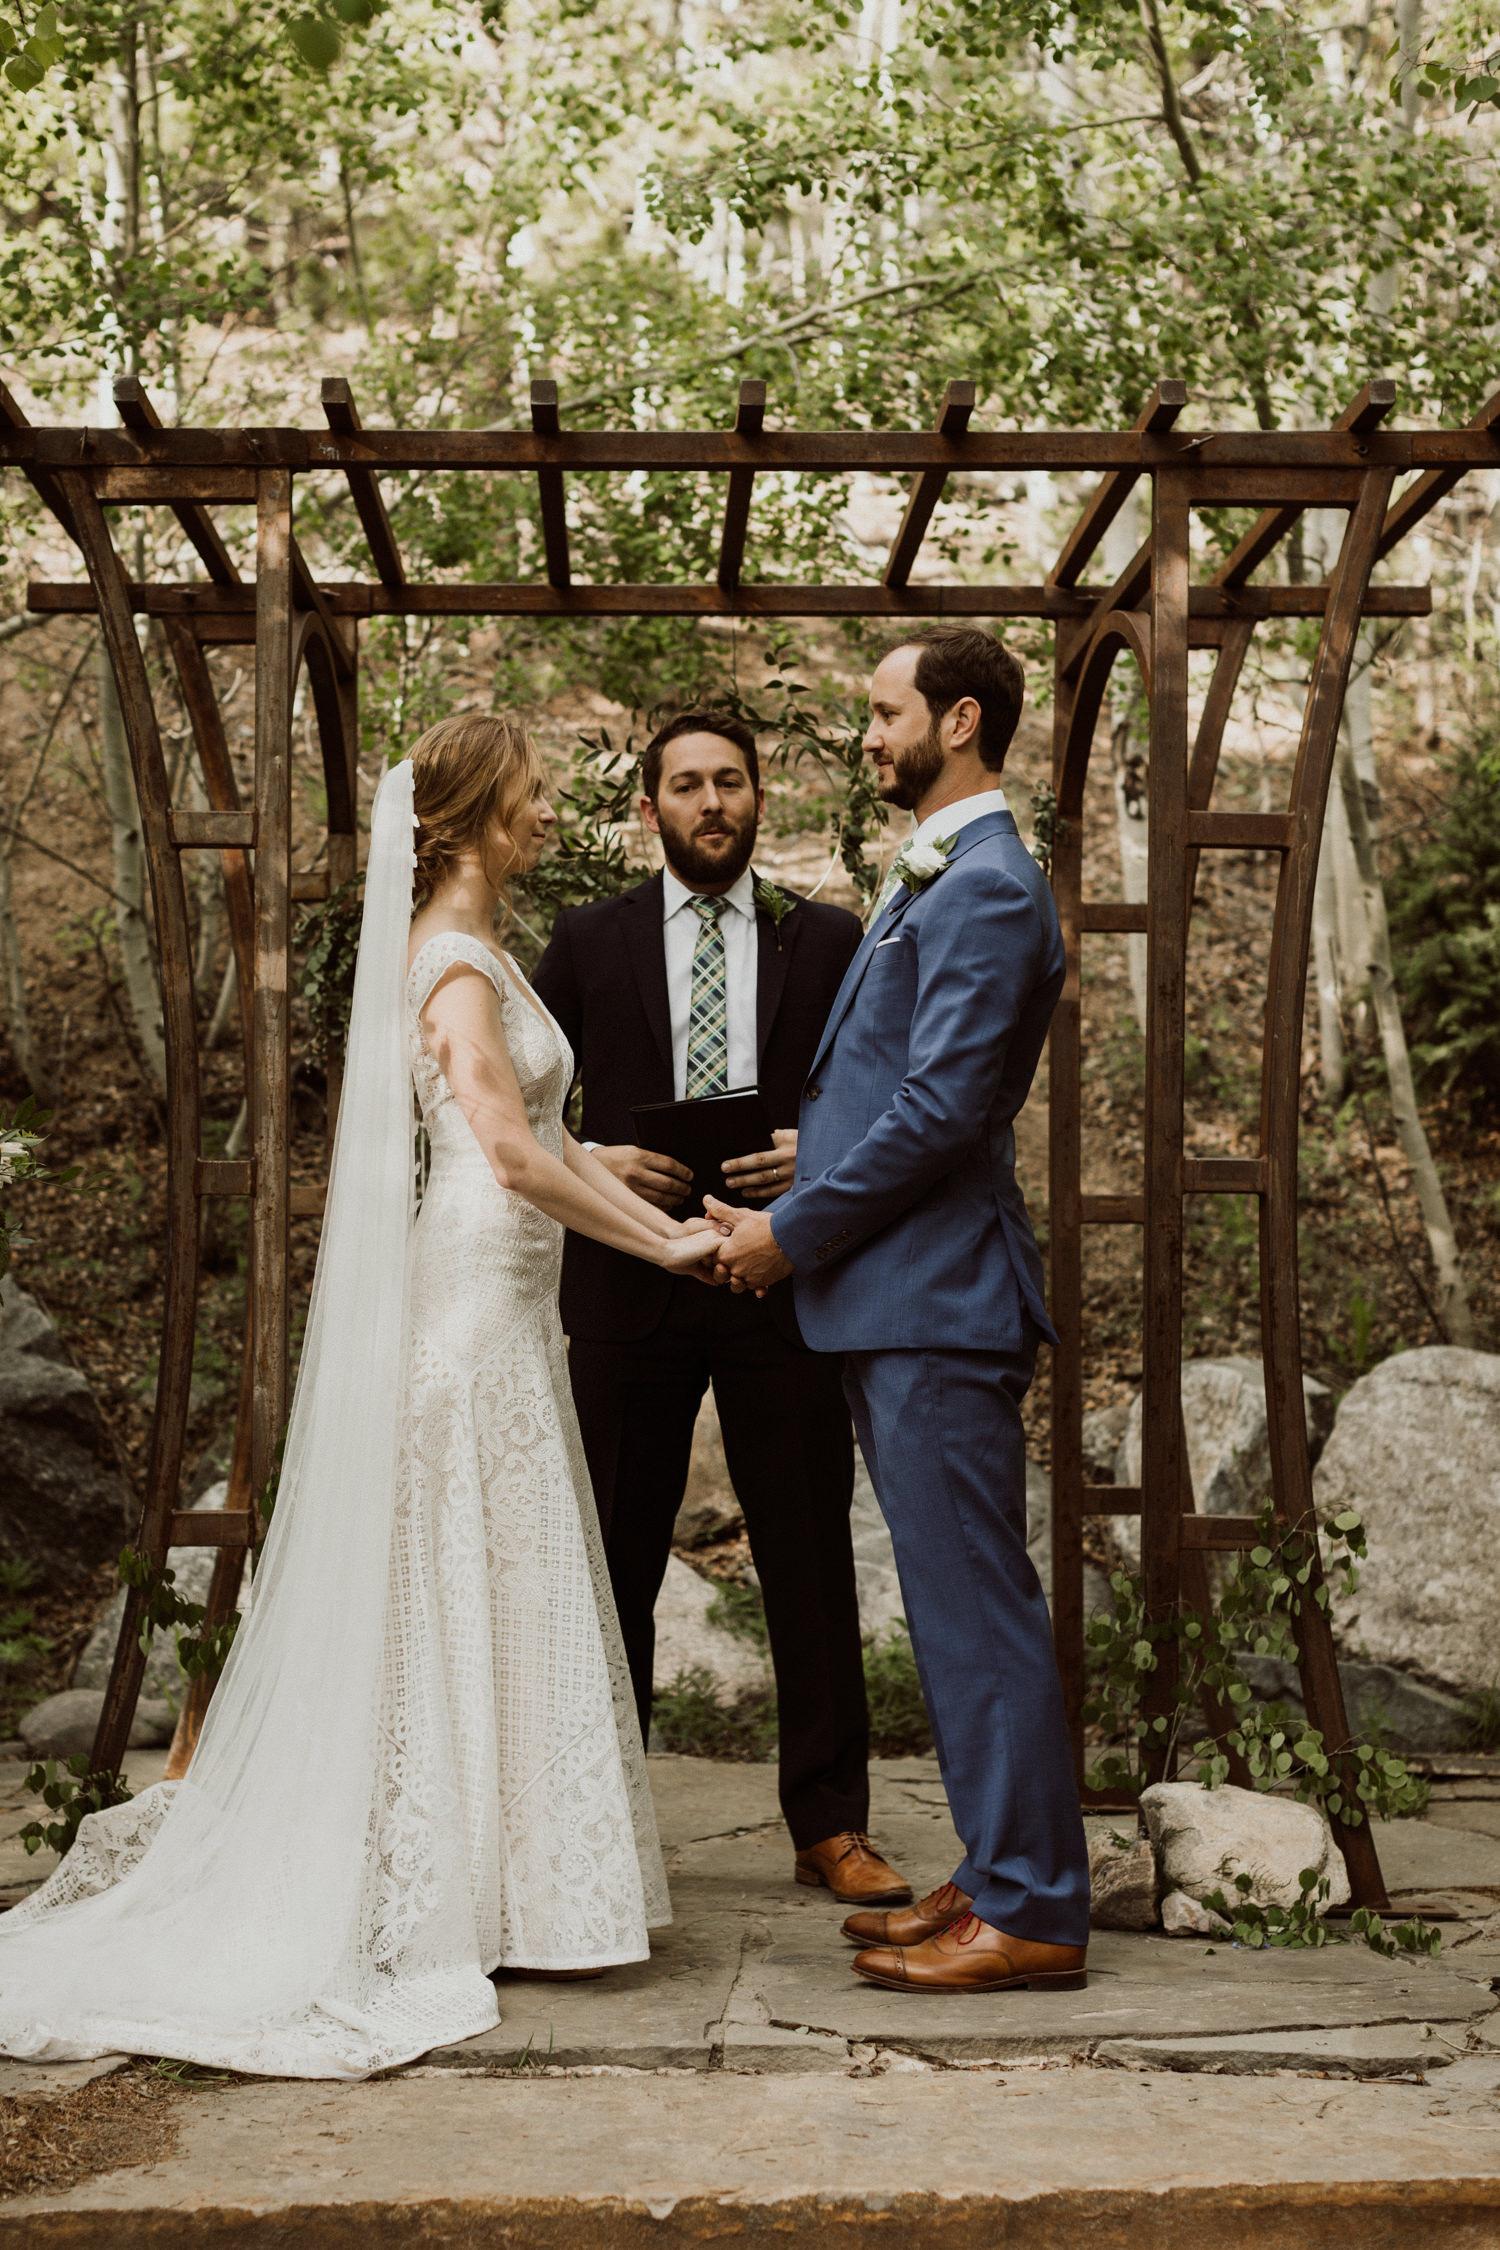 bohemian-backyard-wedding-breckenridge-colorado-74.jpg